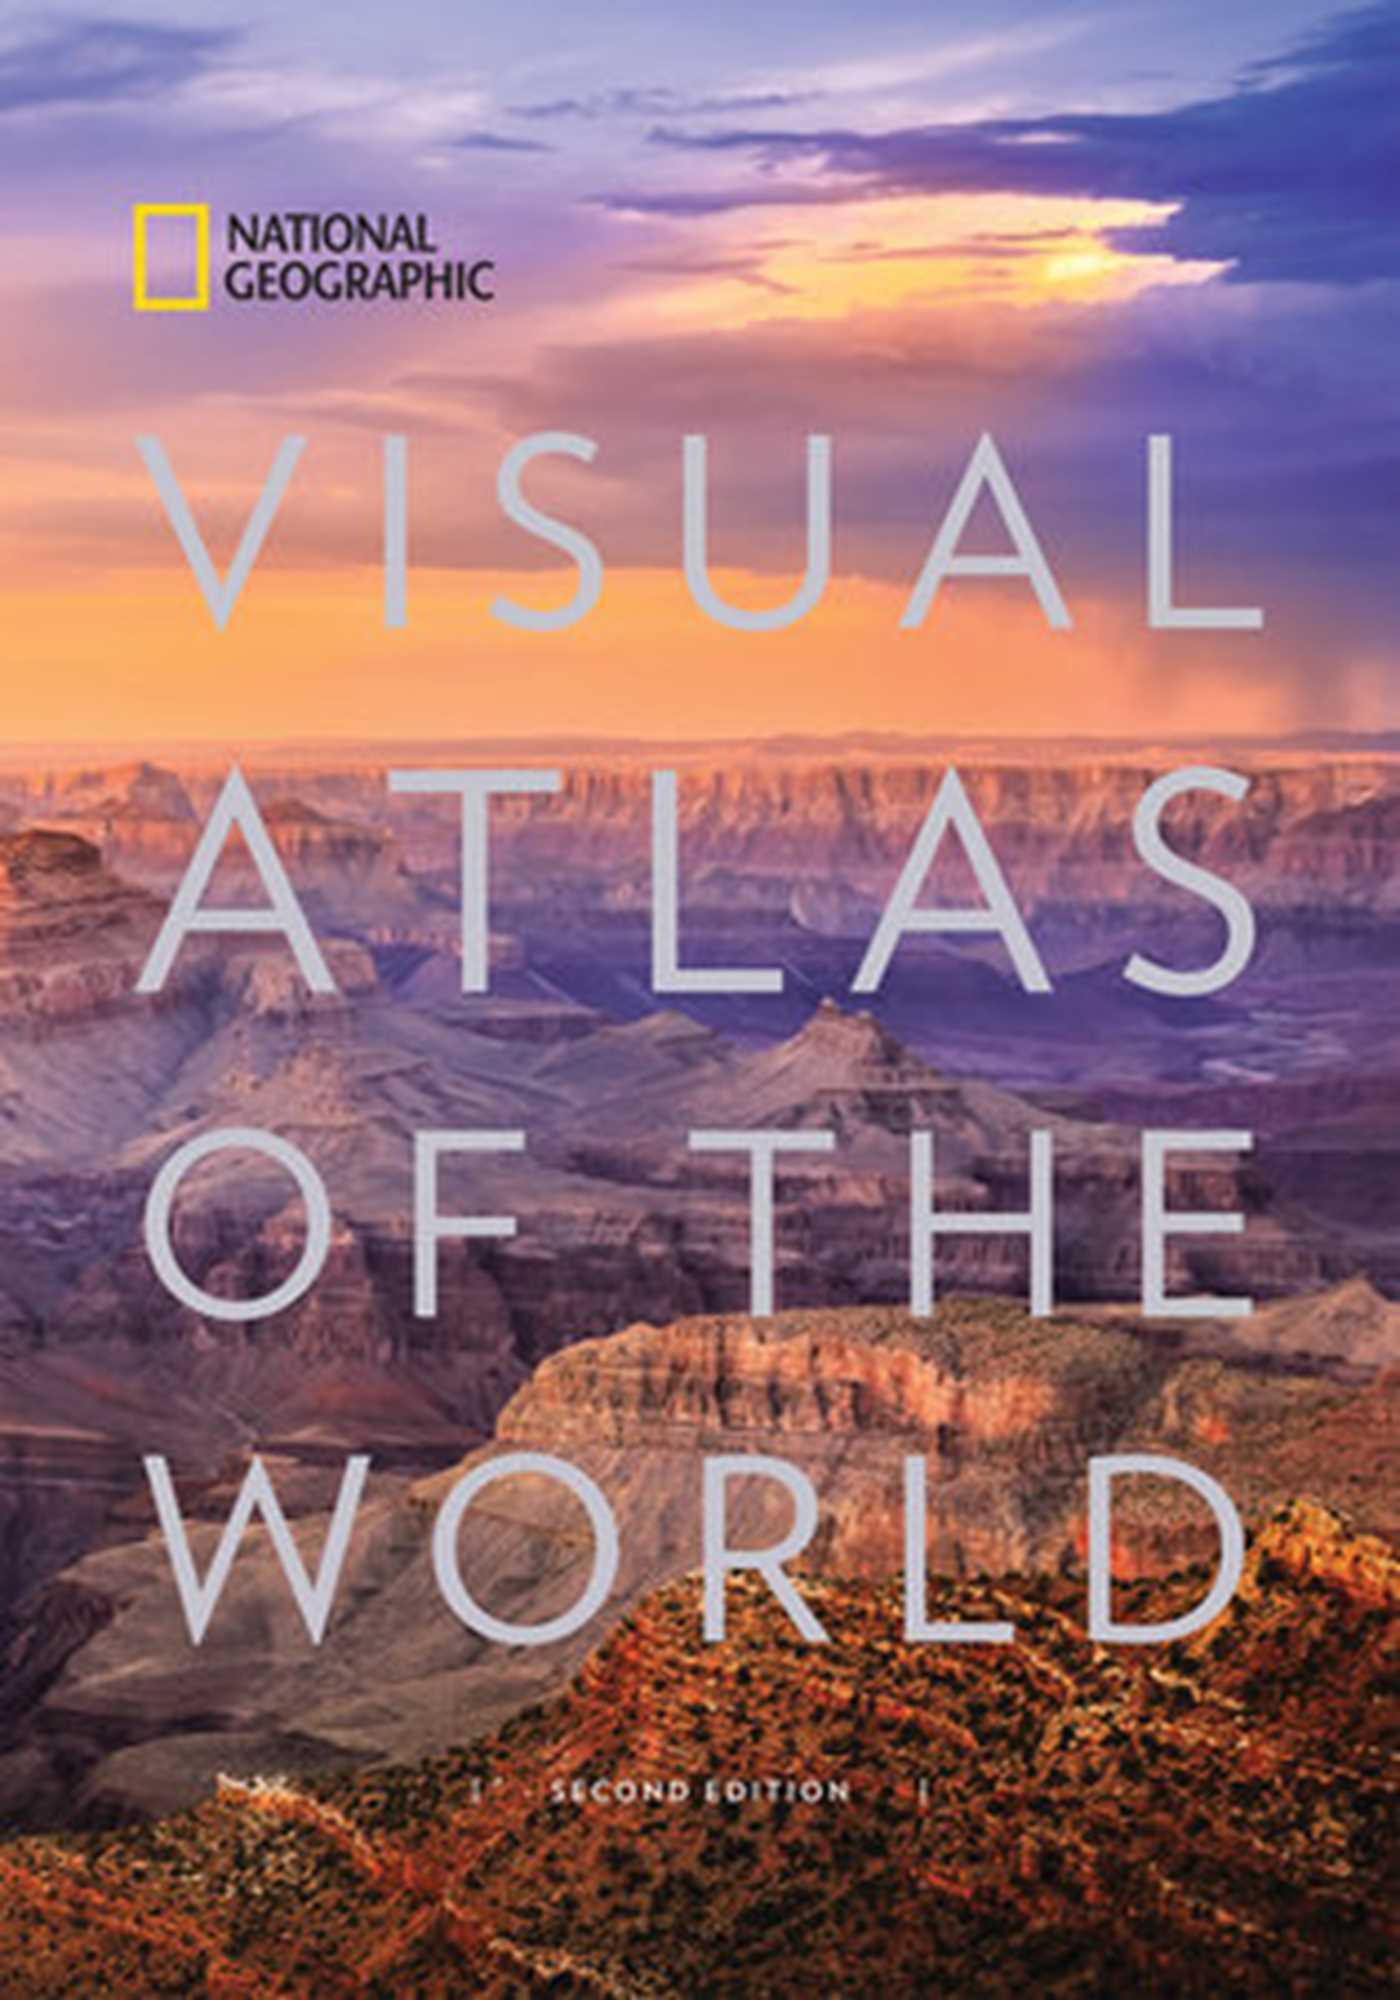 Visual atlas of the world 9781426218385 hr